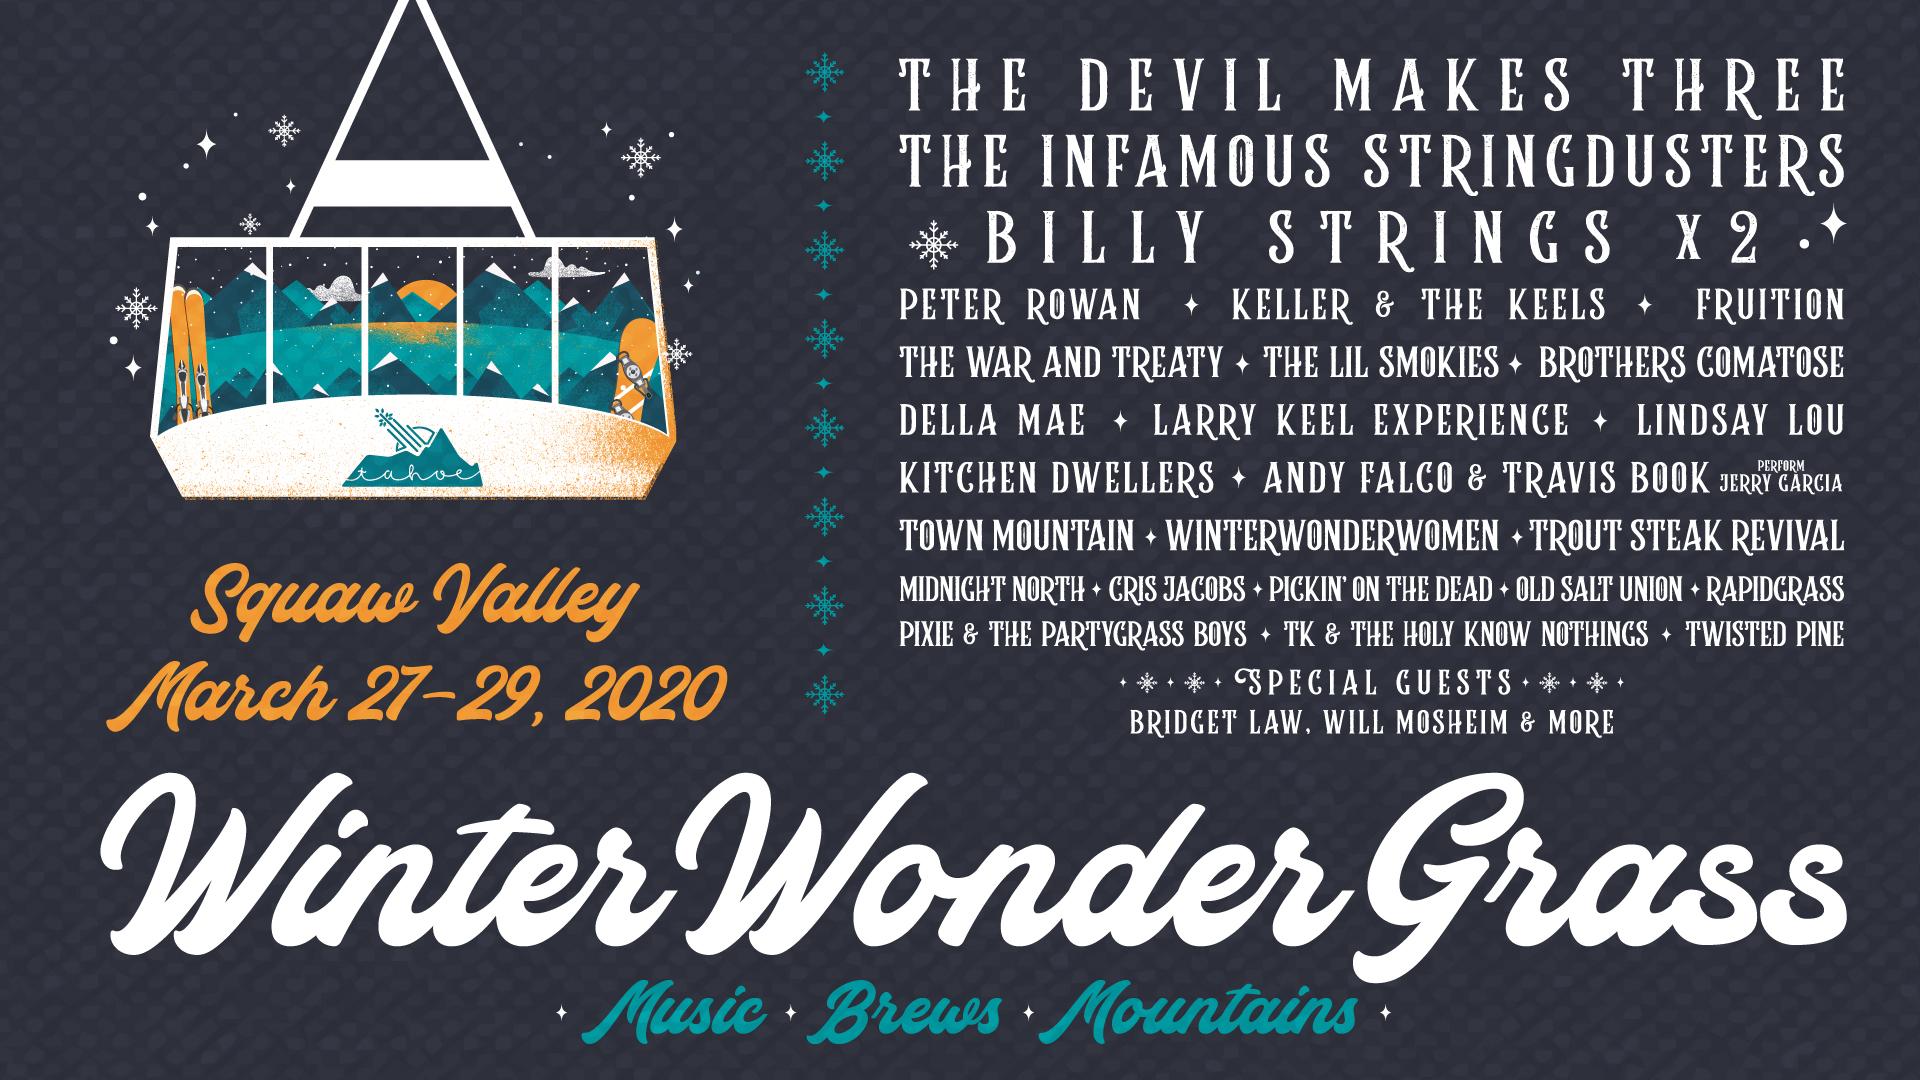 GIVEAWAY: Win tickets to WinterWonderGrass (Squaw Valley, CA) Mar 27-29